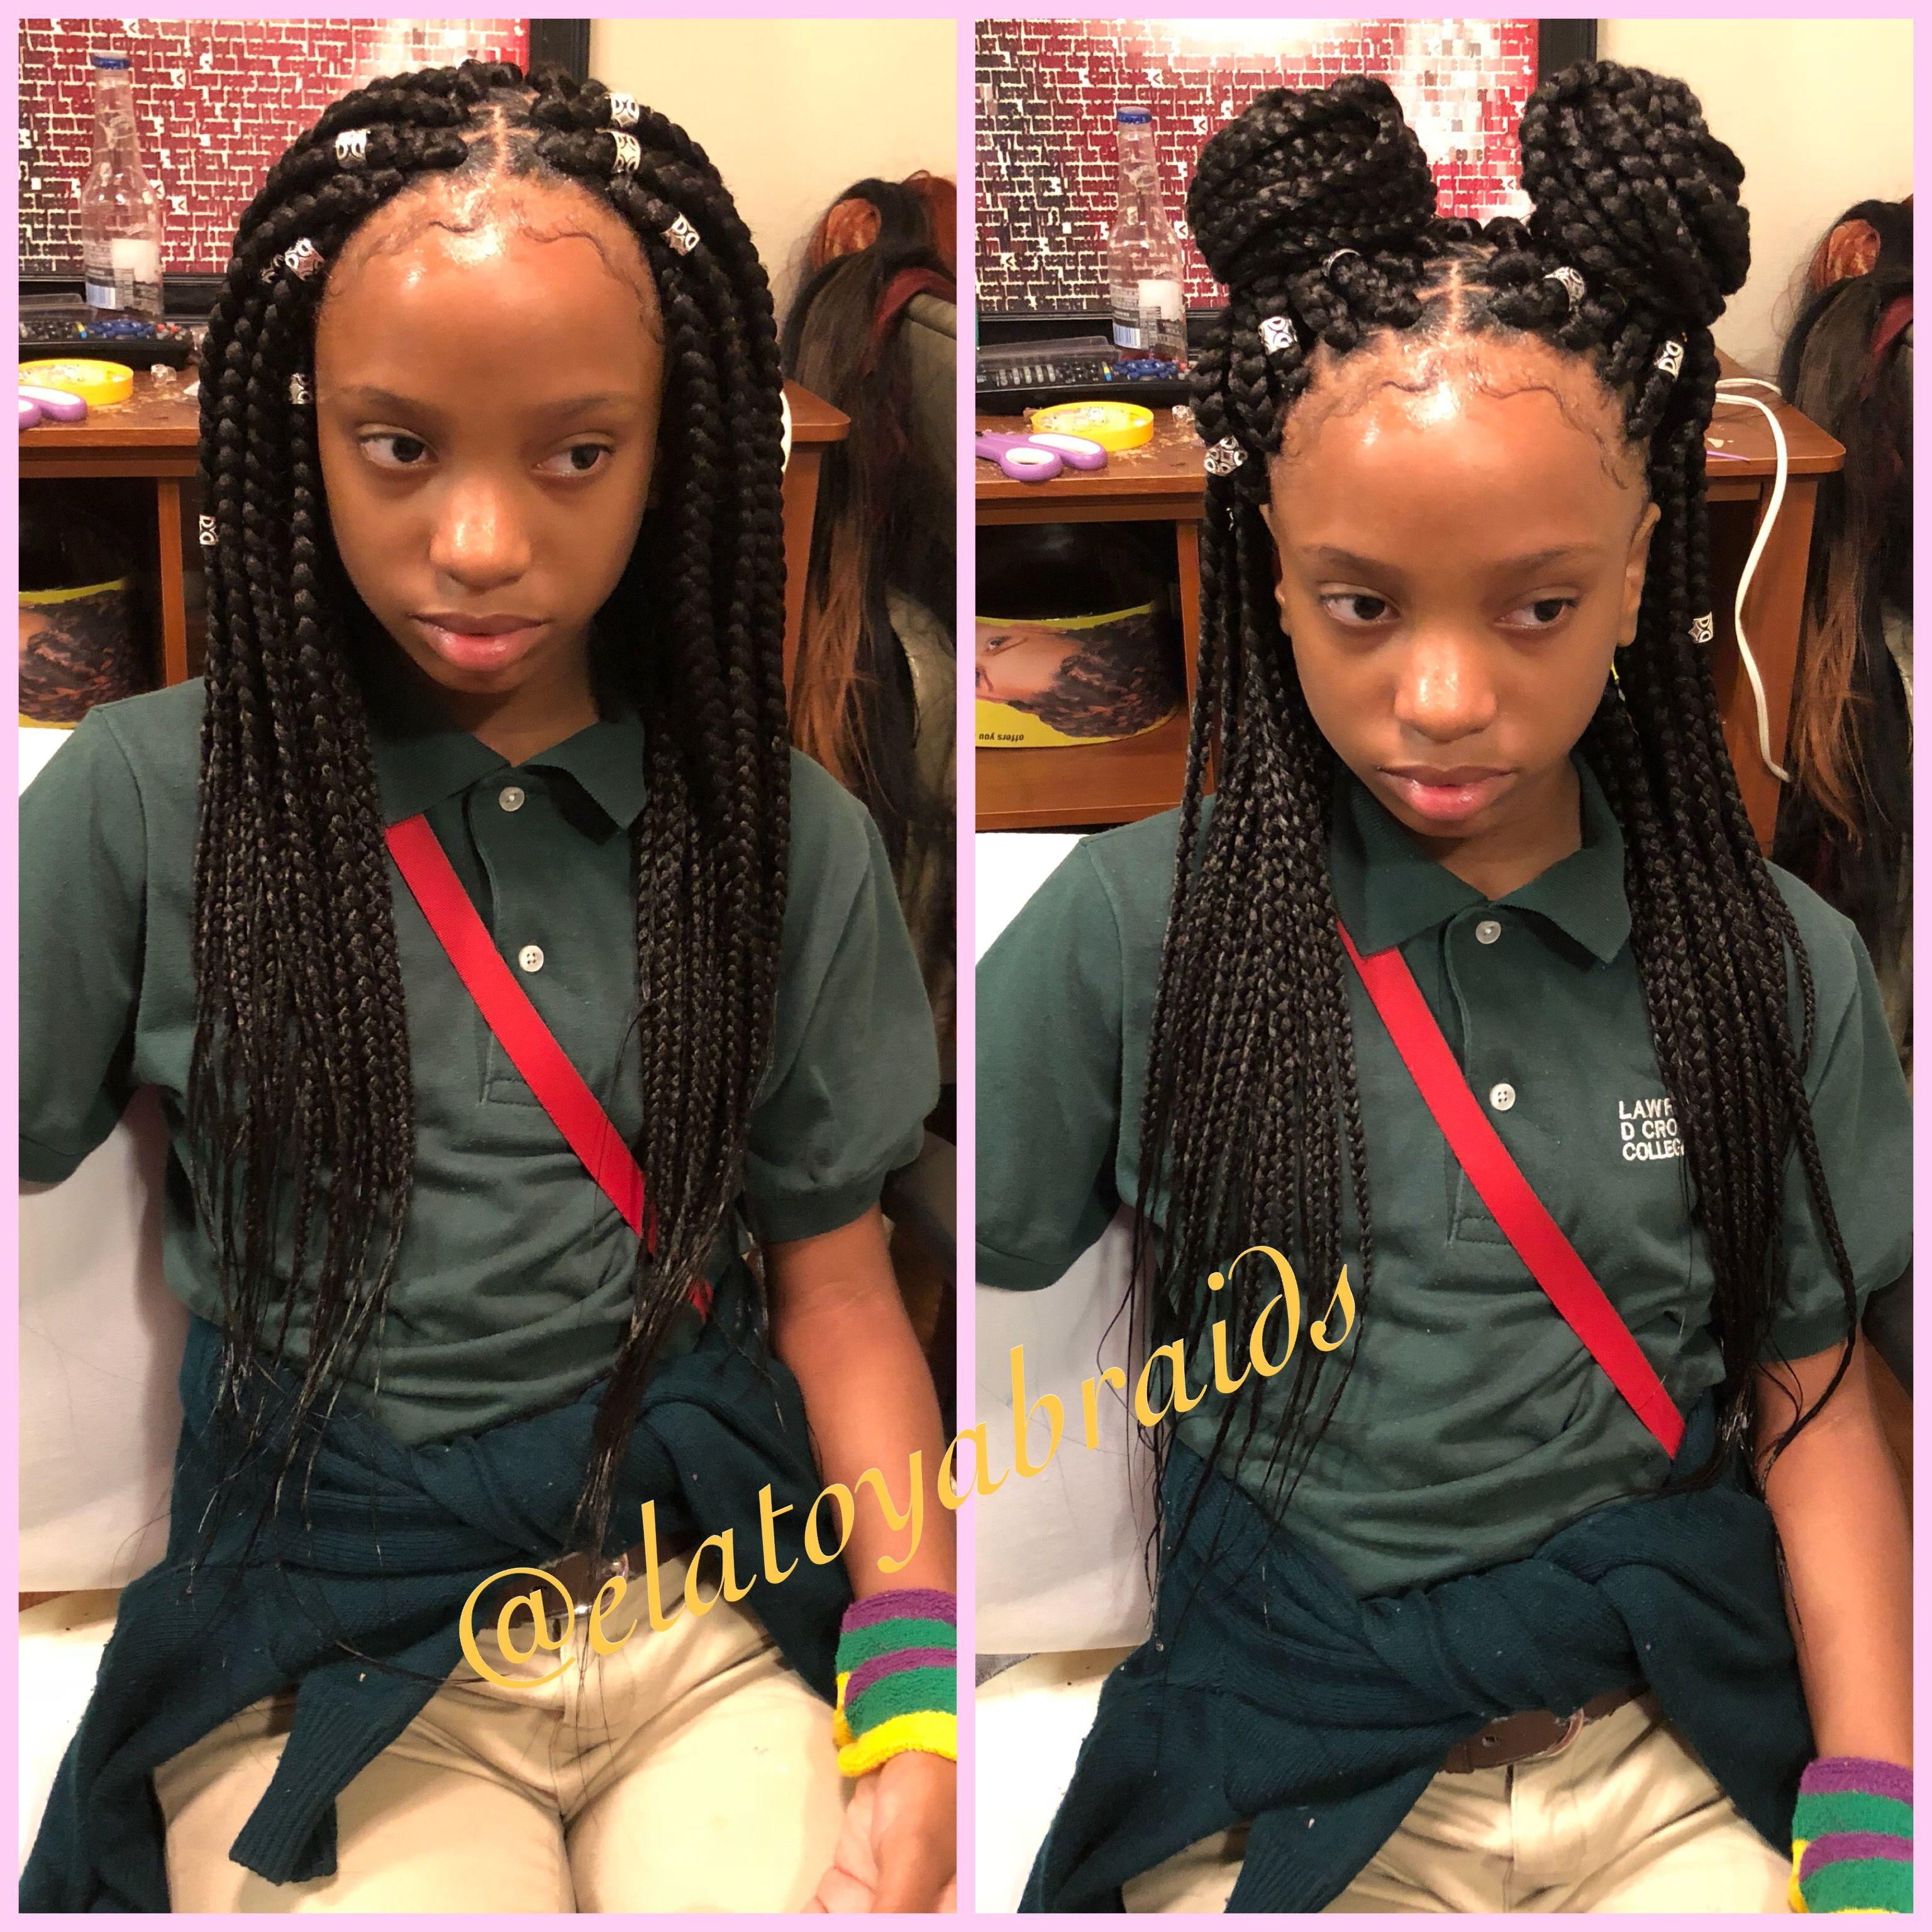 Pin By Joelana On Hair Hair Styles Braided Hairstyles Girls Hairstyles Braids